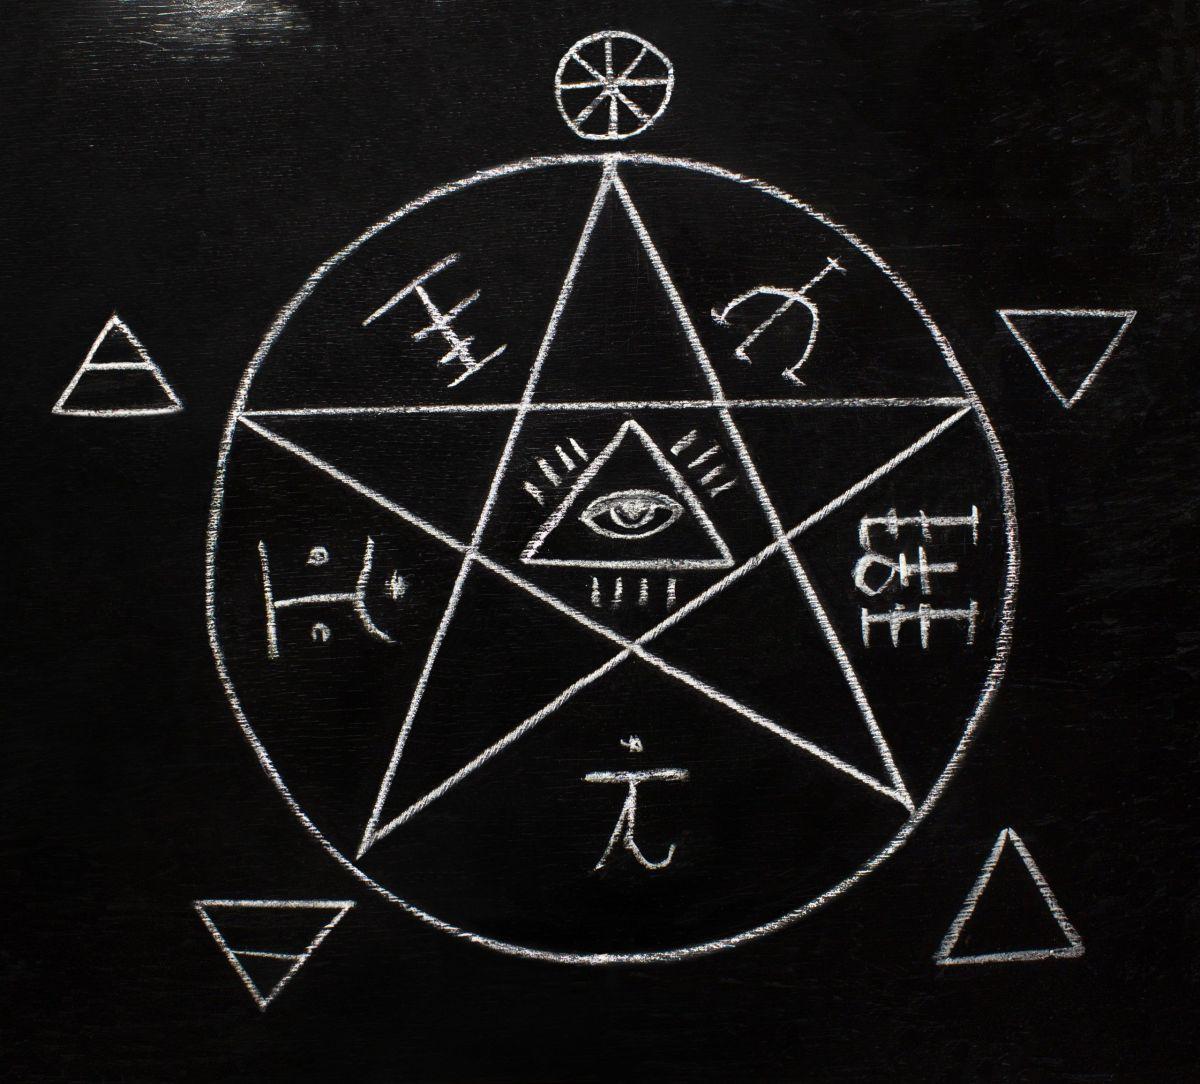 pentagram and symbols